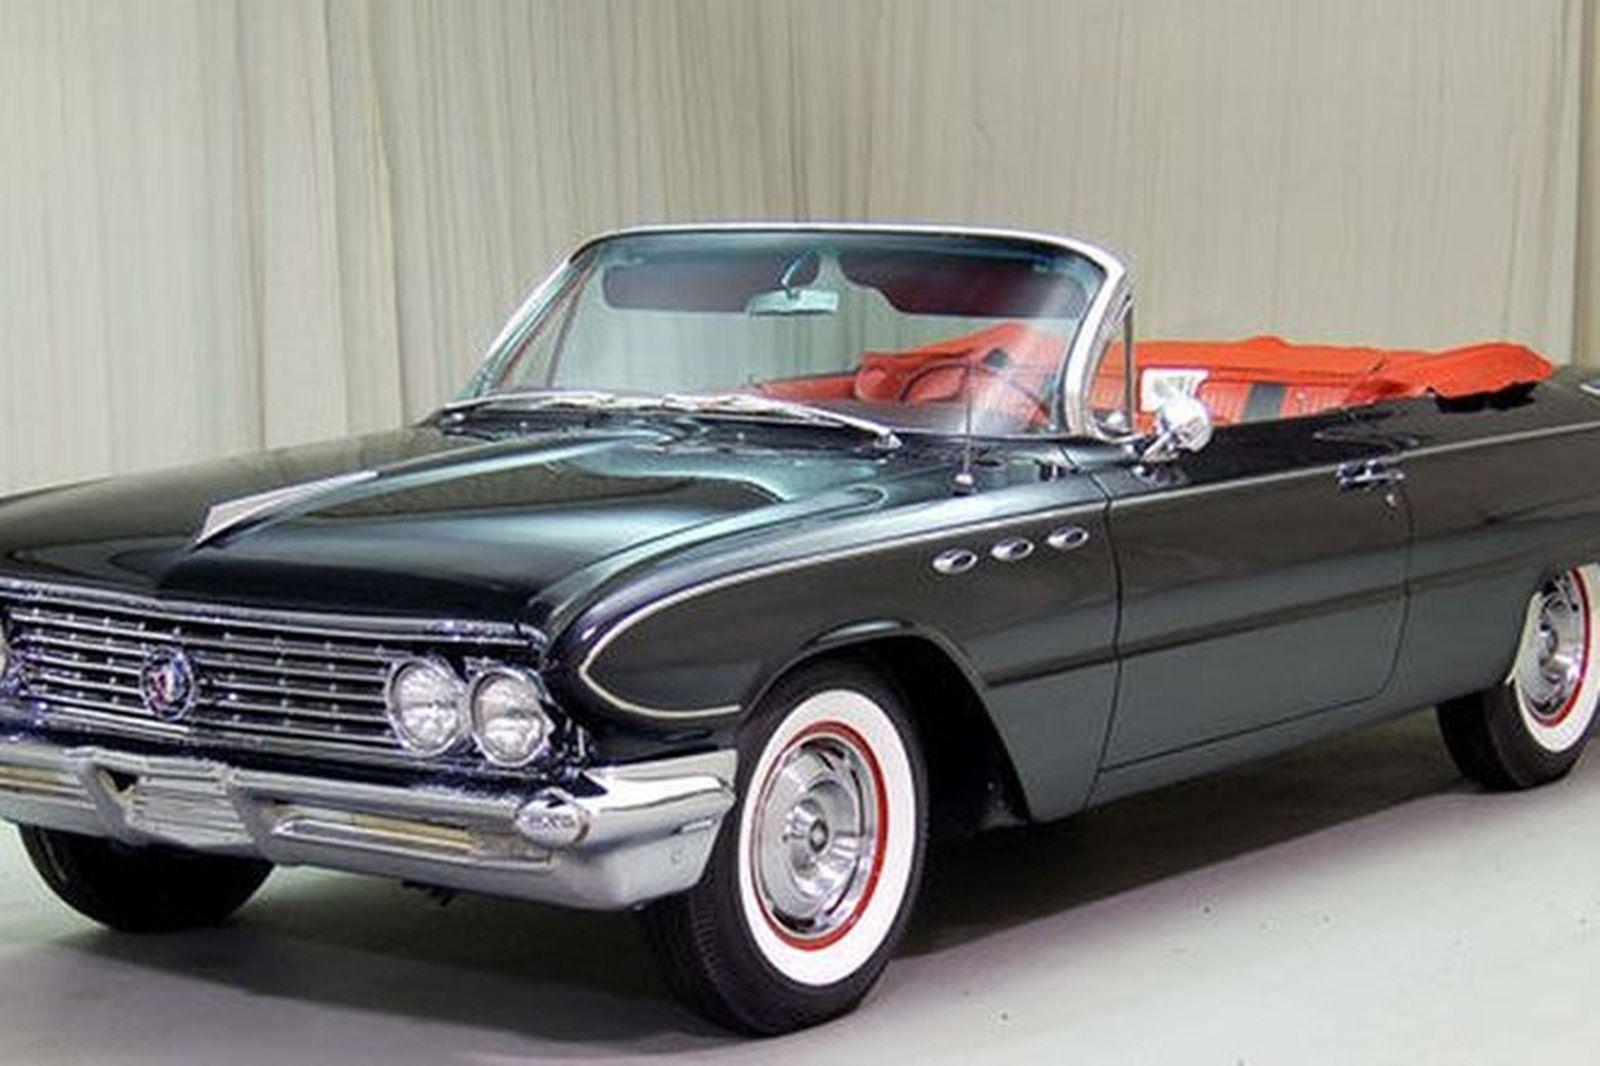 Buick Electra 225 4 Door Convertible Auctions Lot 11 Shannons 1961 21 Oct 2007 Lesabre